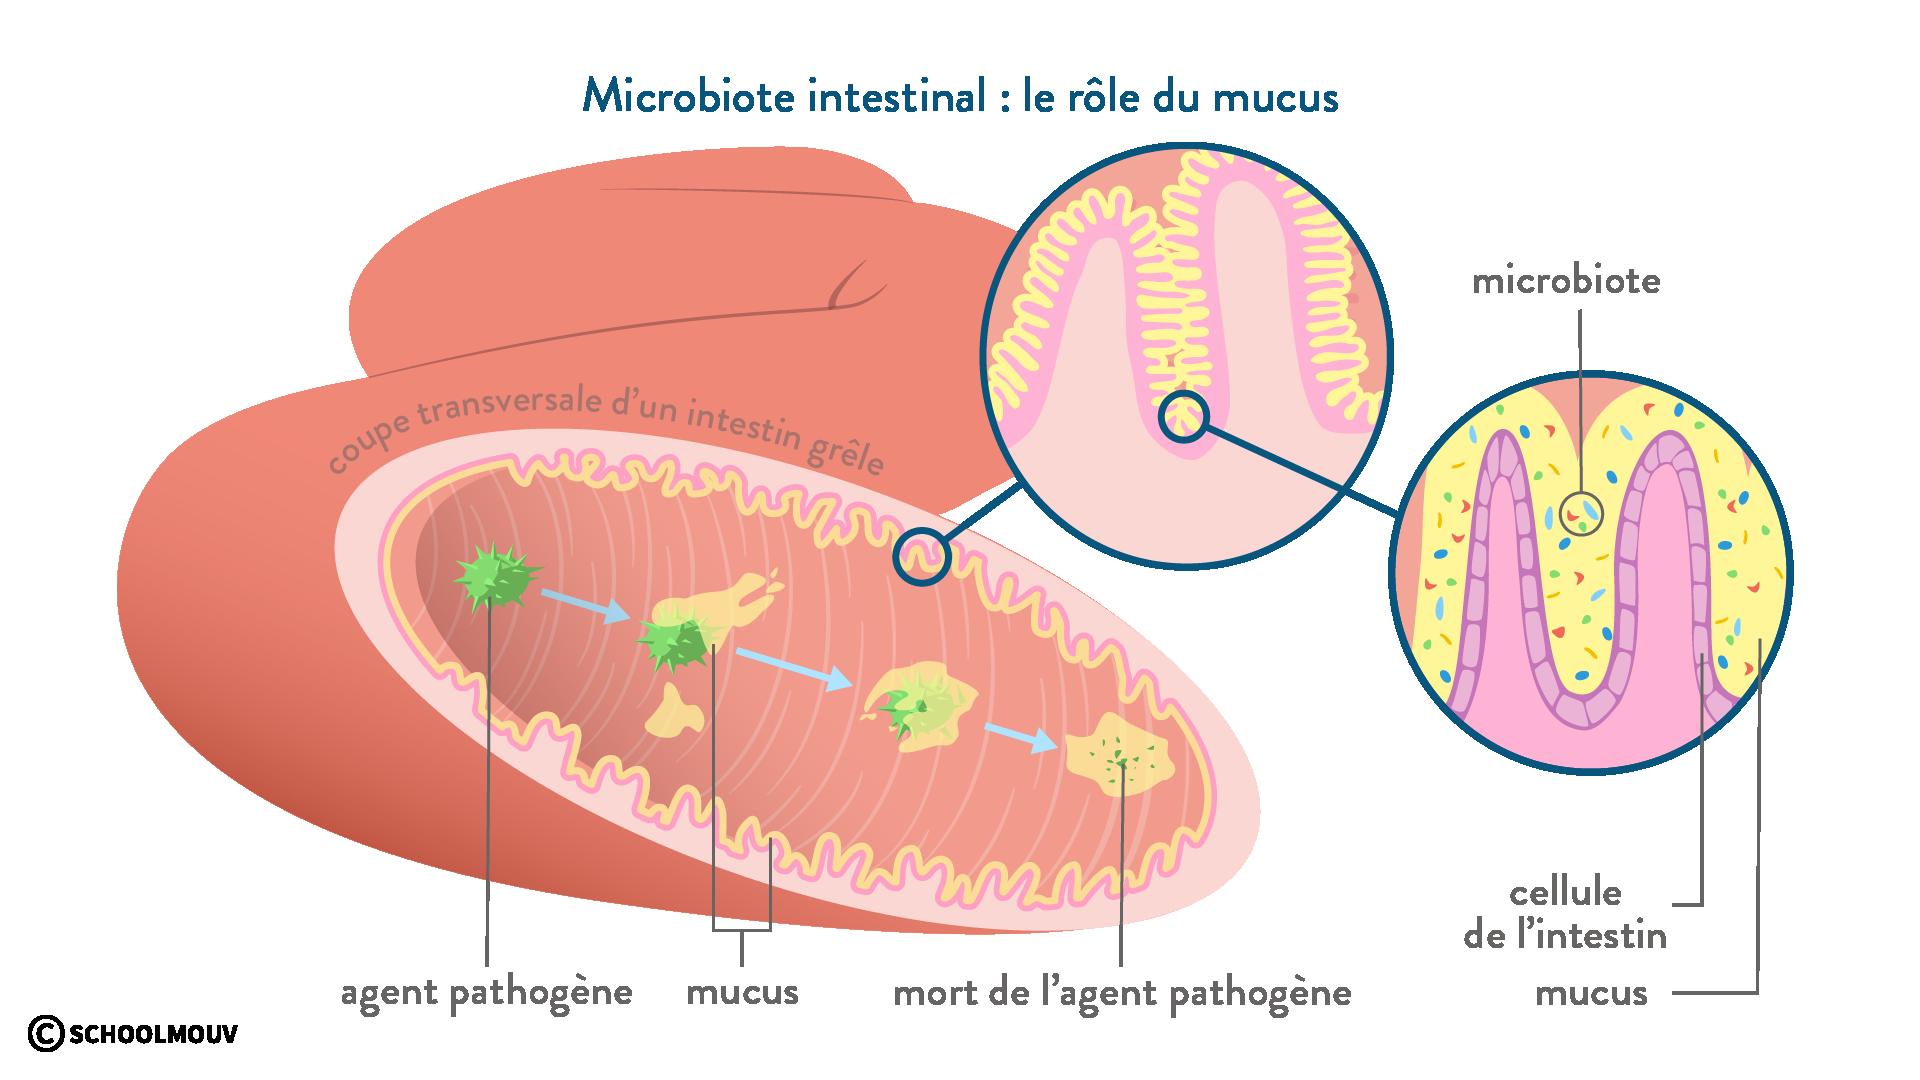 microbiote élimination pathogène mucus